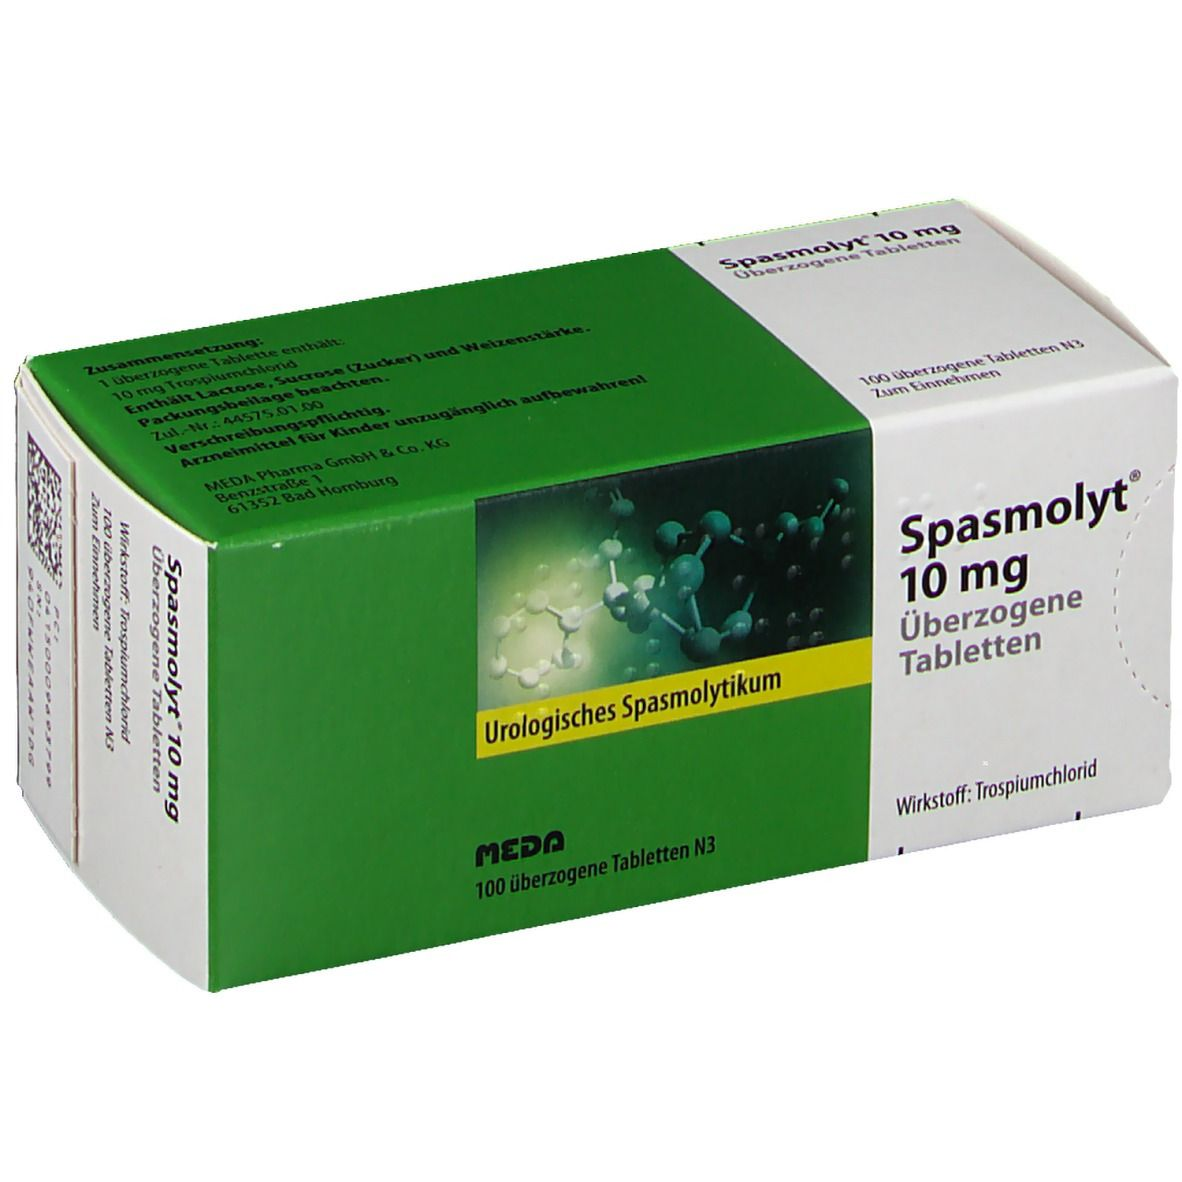 Spasmolyt 10 mg Dragees